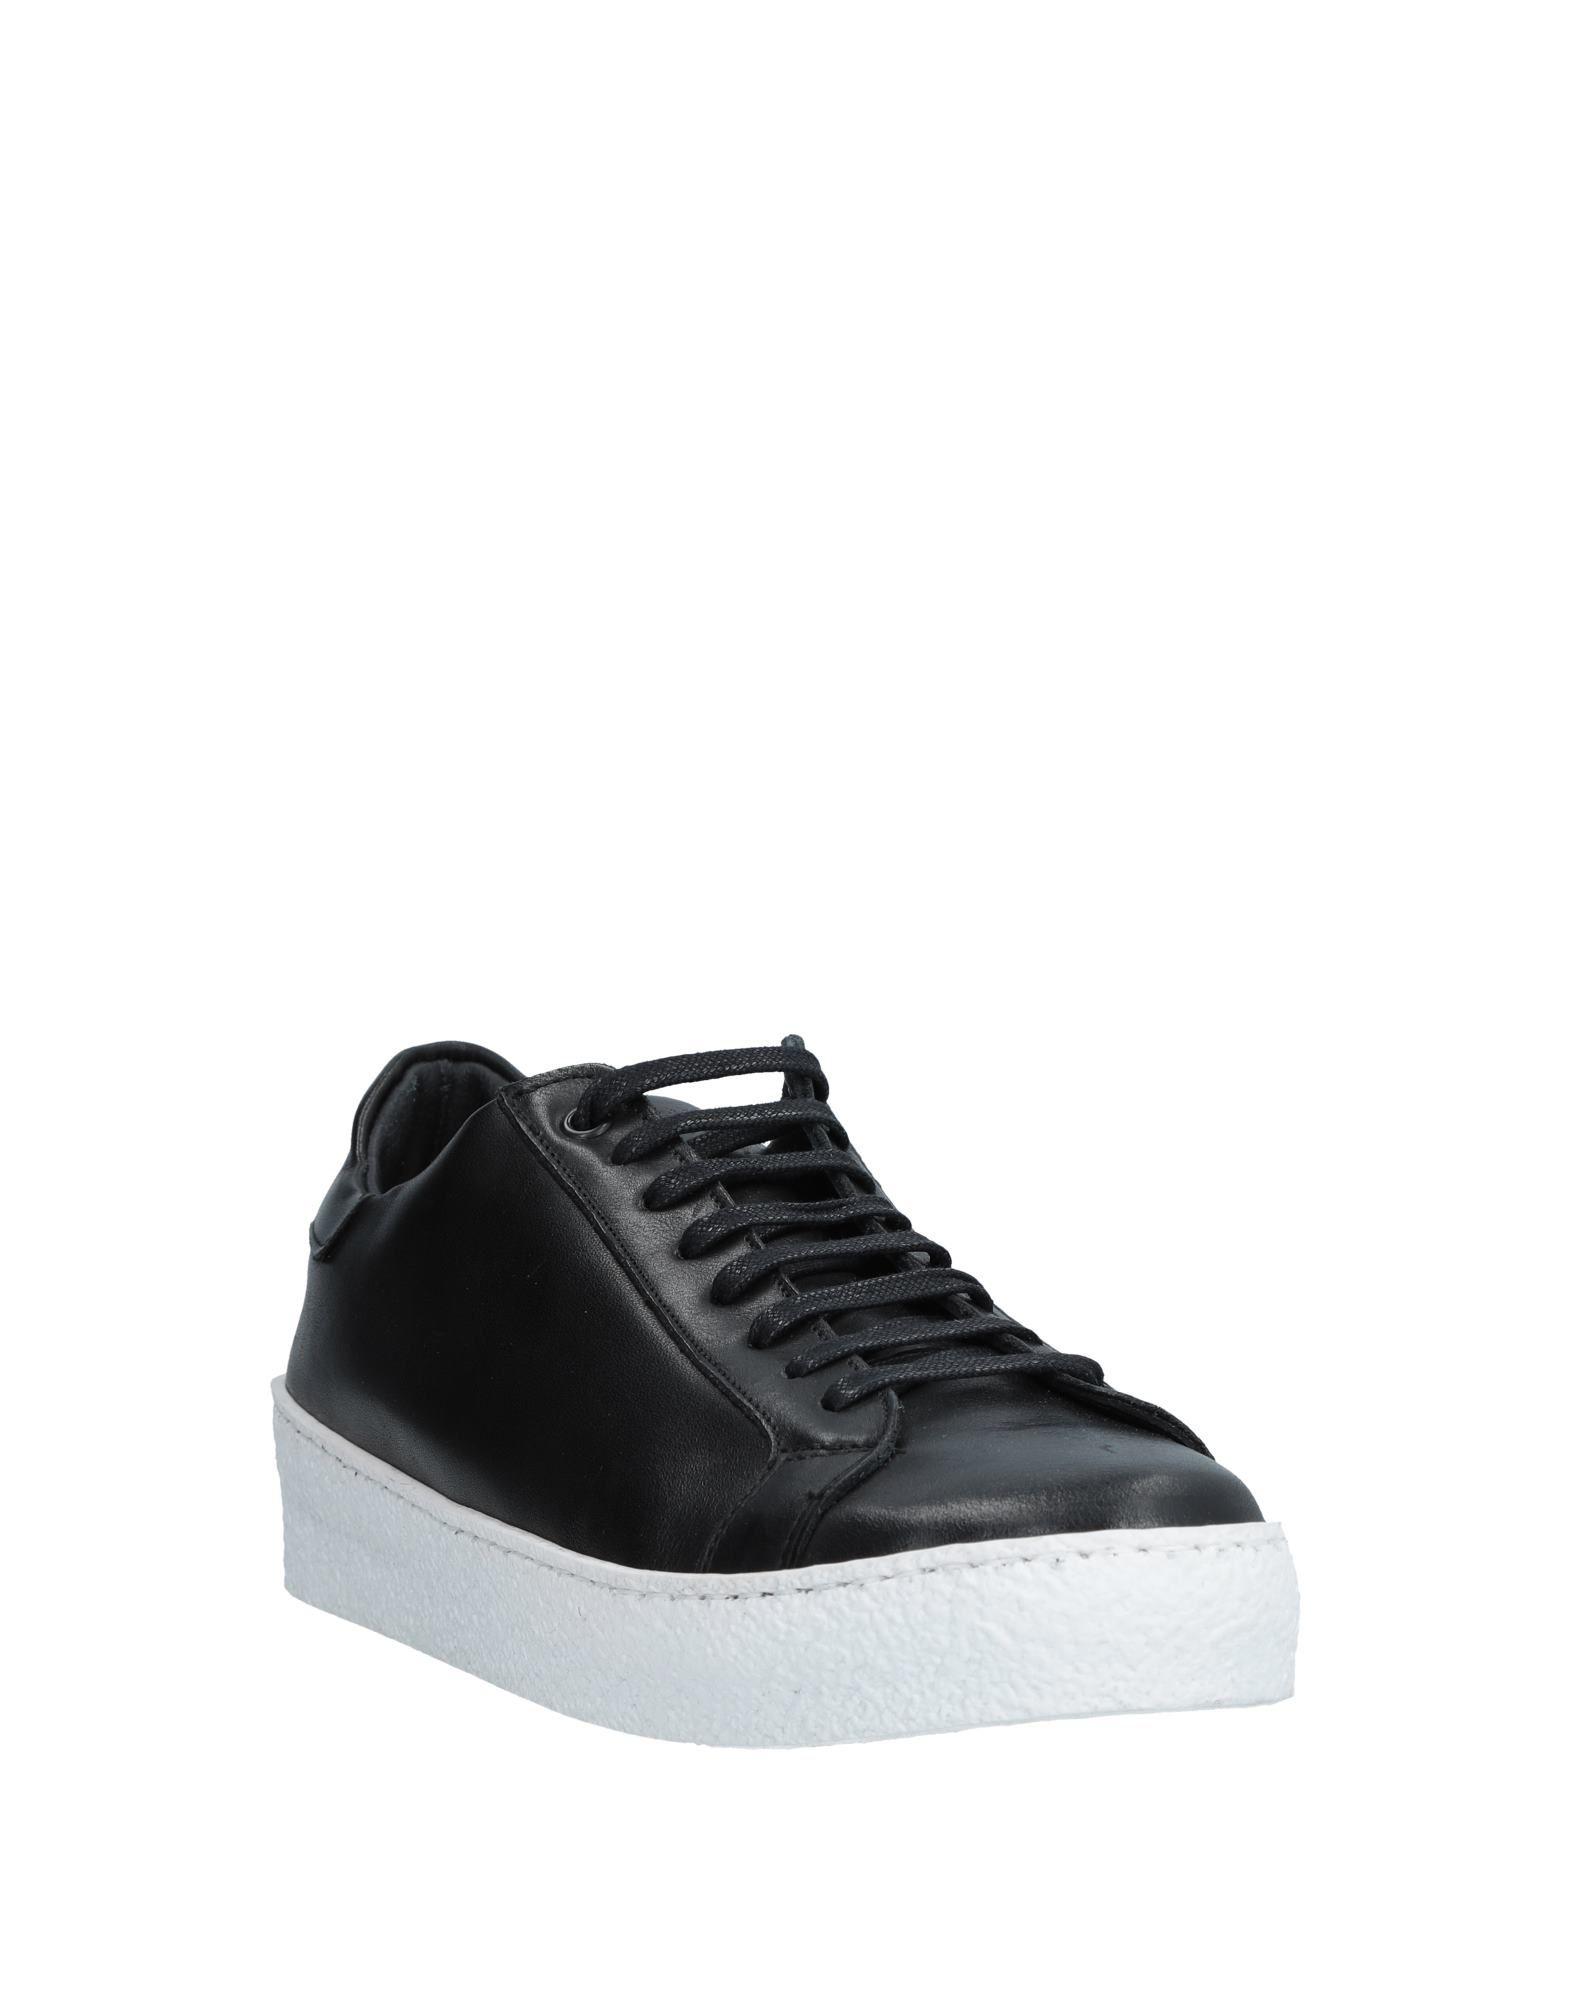 Bottega Marchigiana Sneakers Herren Herren Sneakers Gutes Preis-Leistungs-Verhältnis, es lohnt sich 39bb8e